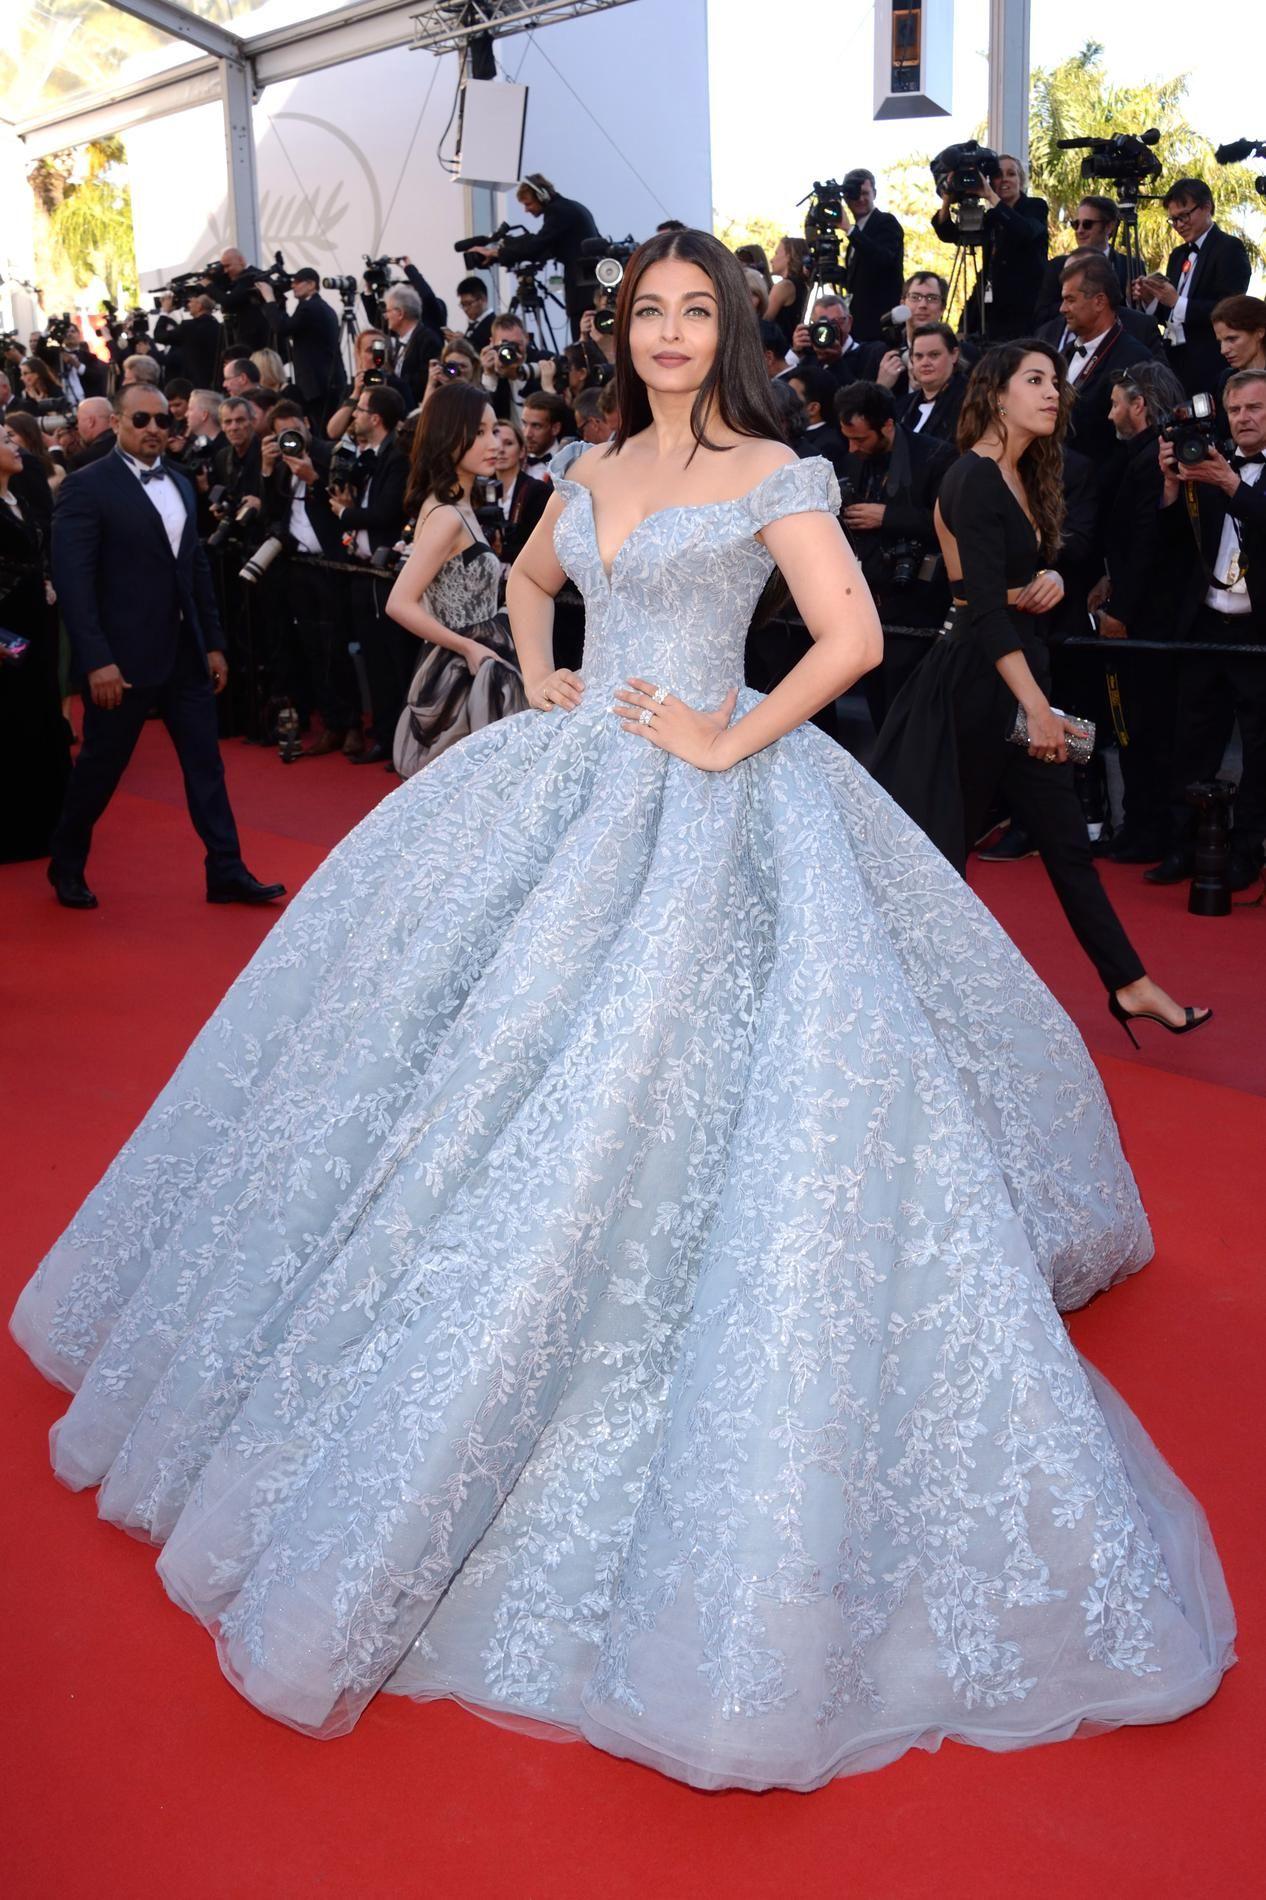 Aishwarya rai wedding dress  Nicole Kidman Elle Fanning Laetitia Casta Les plus belles